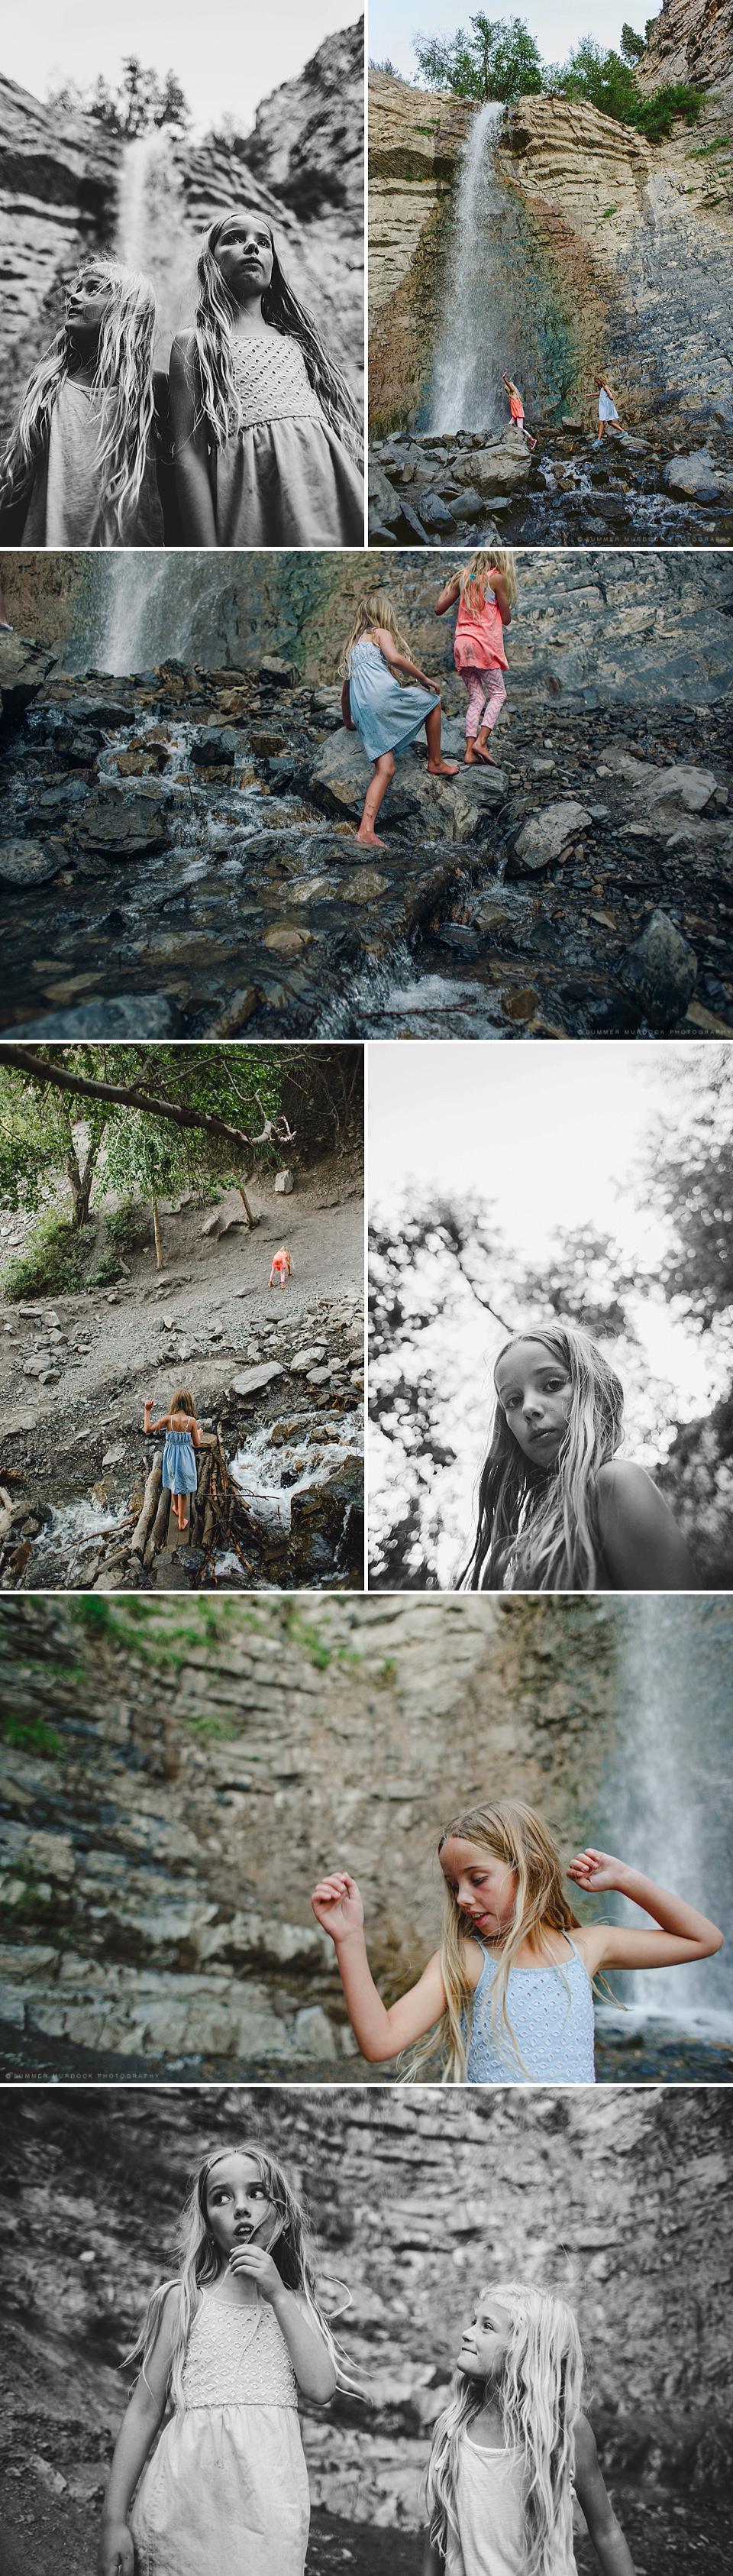 Summer Murdock Photography Salt Lake CIty, Utah Photographer